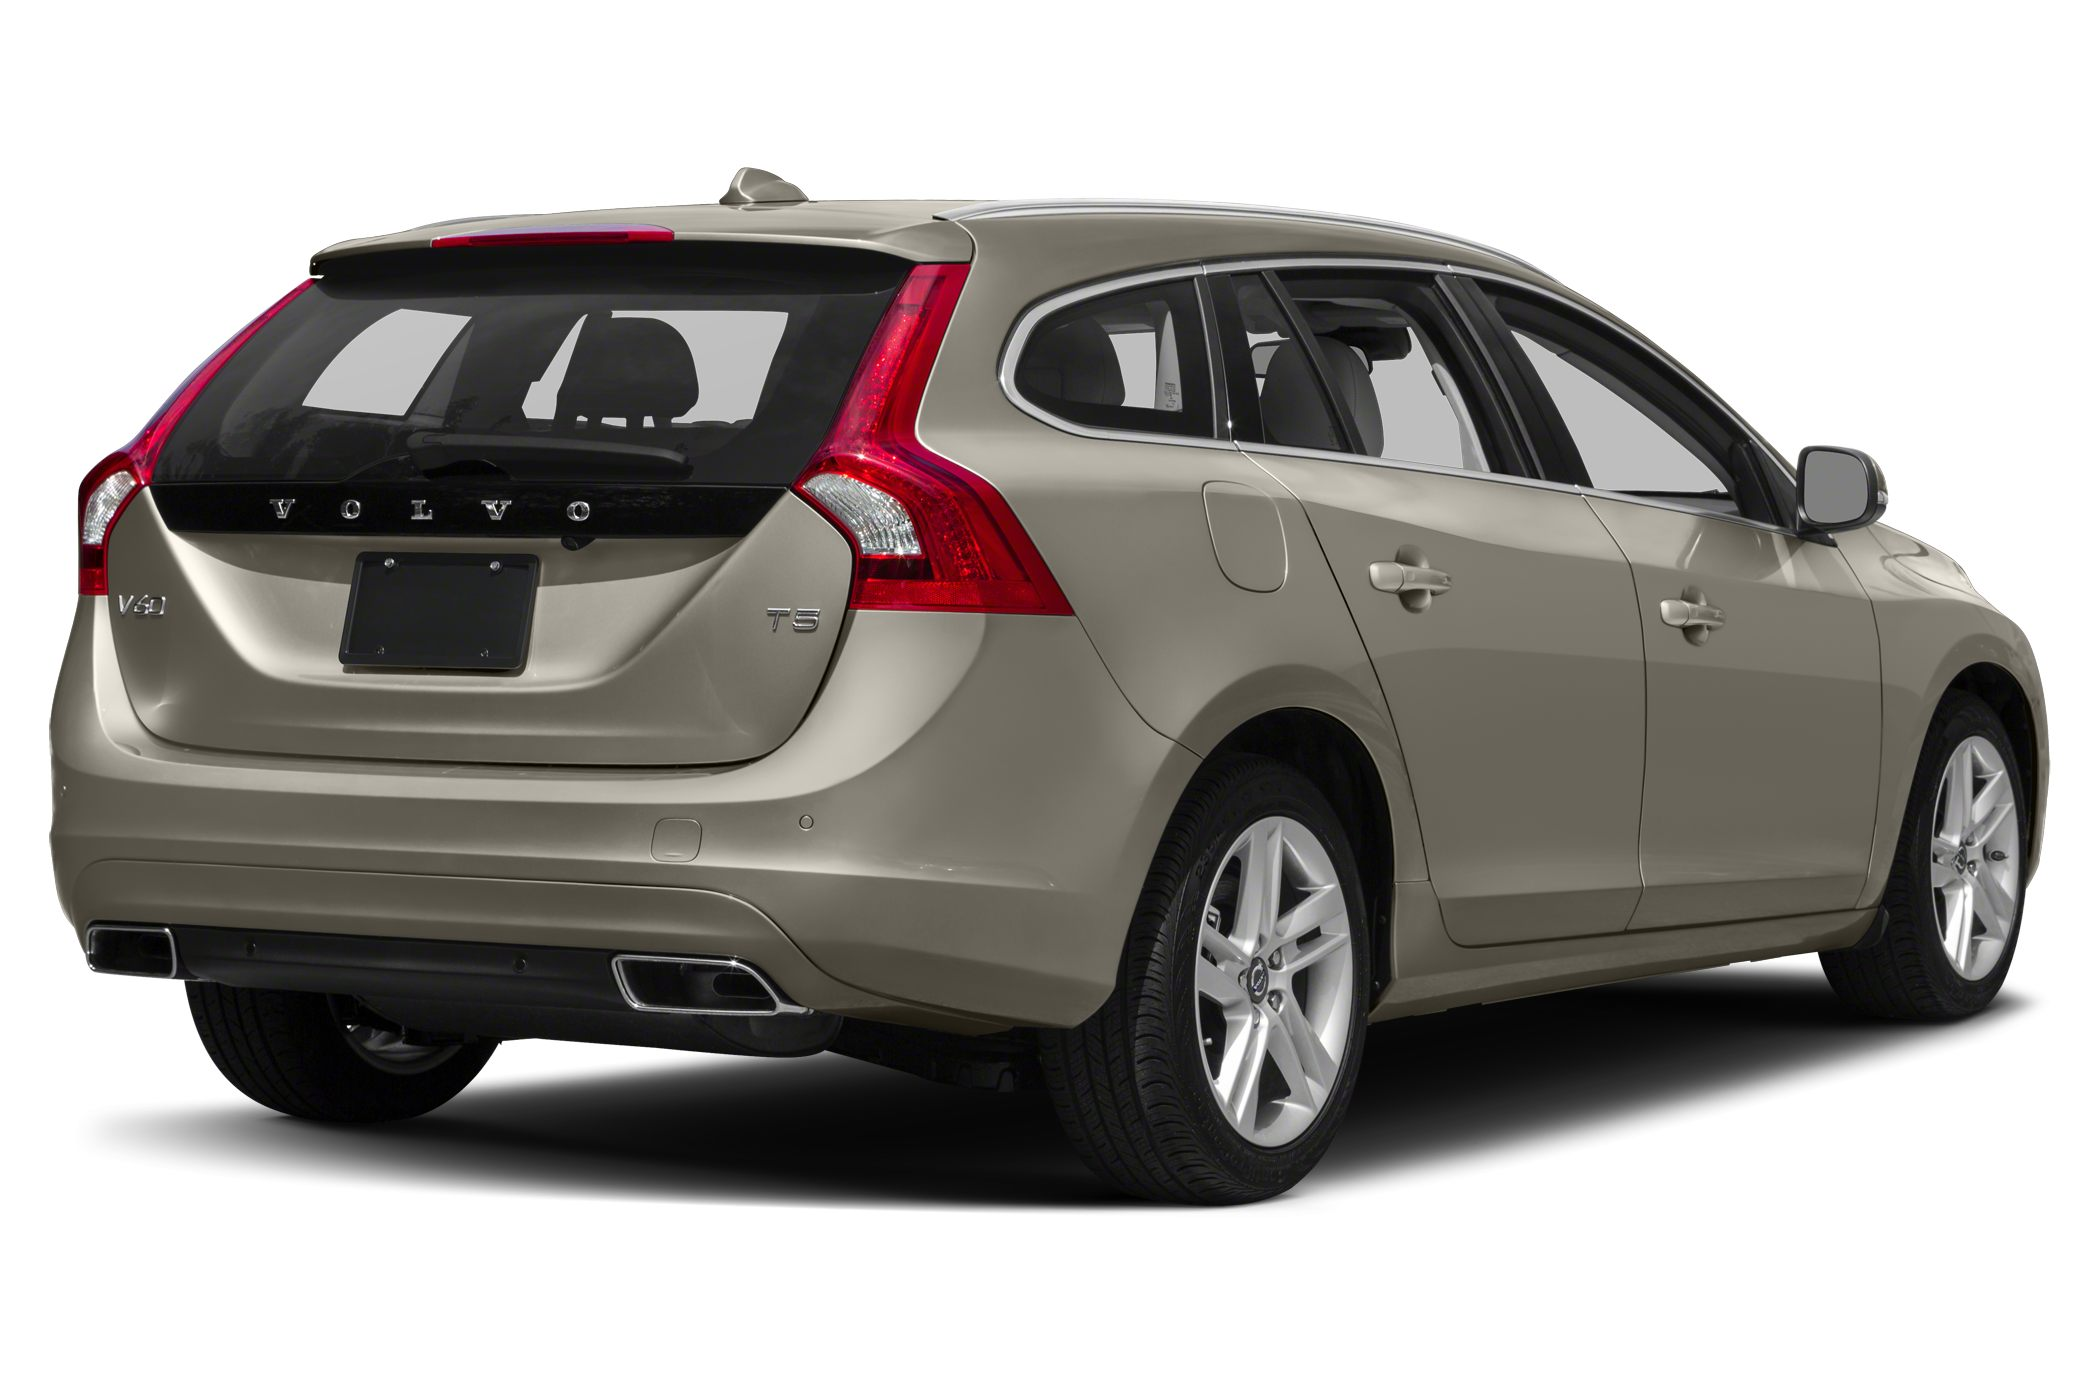 2015.5 Volvo V60 Exterior Photo